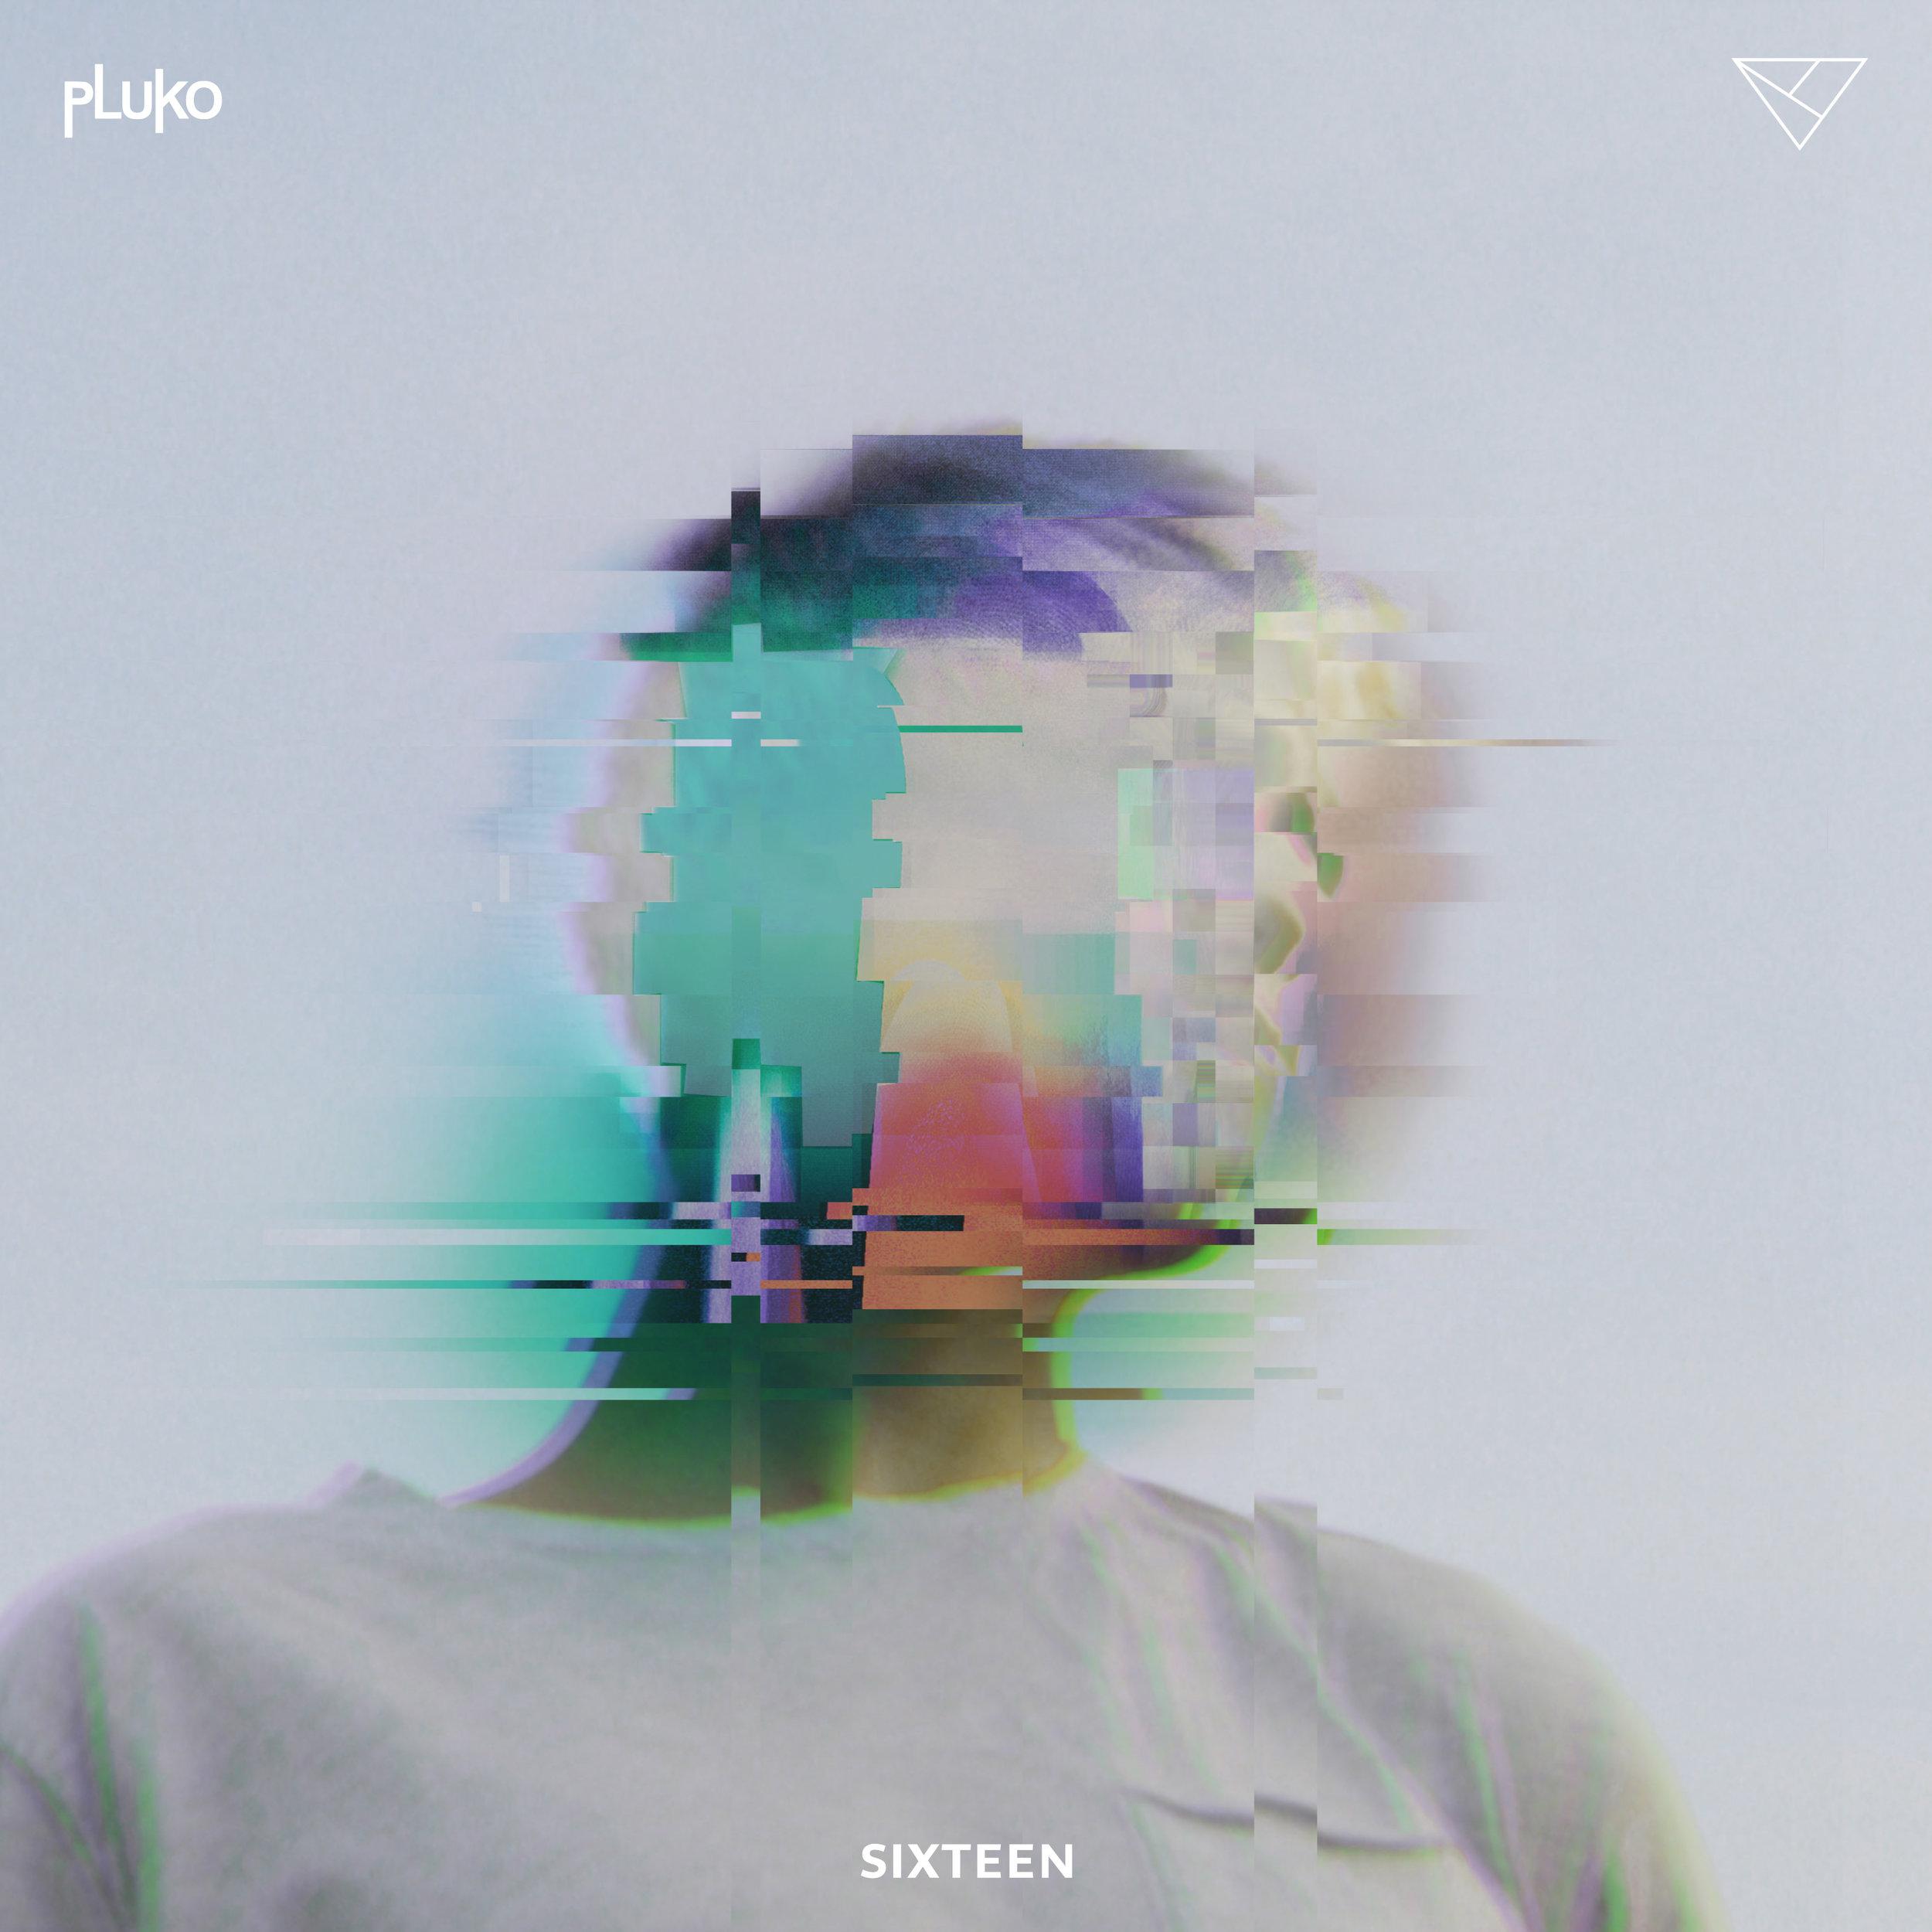 pluko-sixteen-cover-3000.jpg